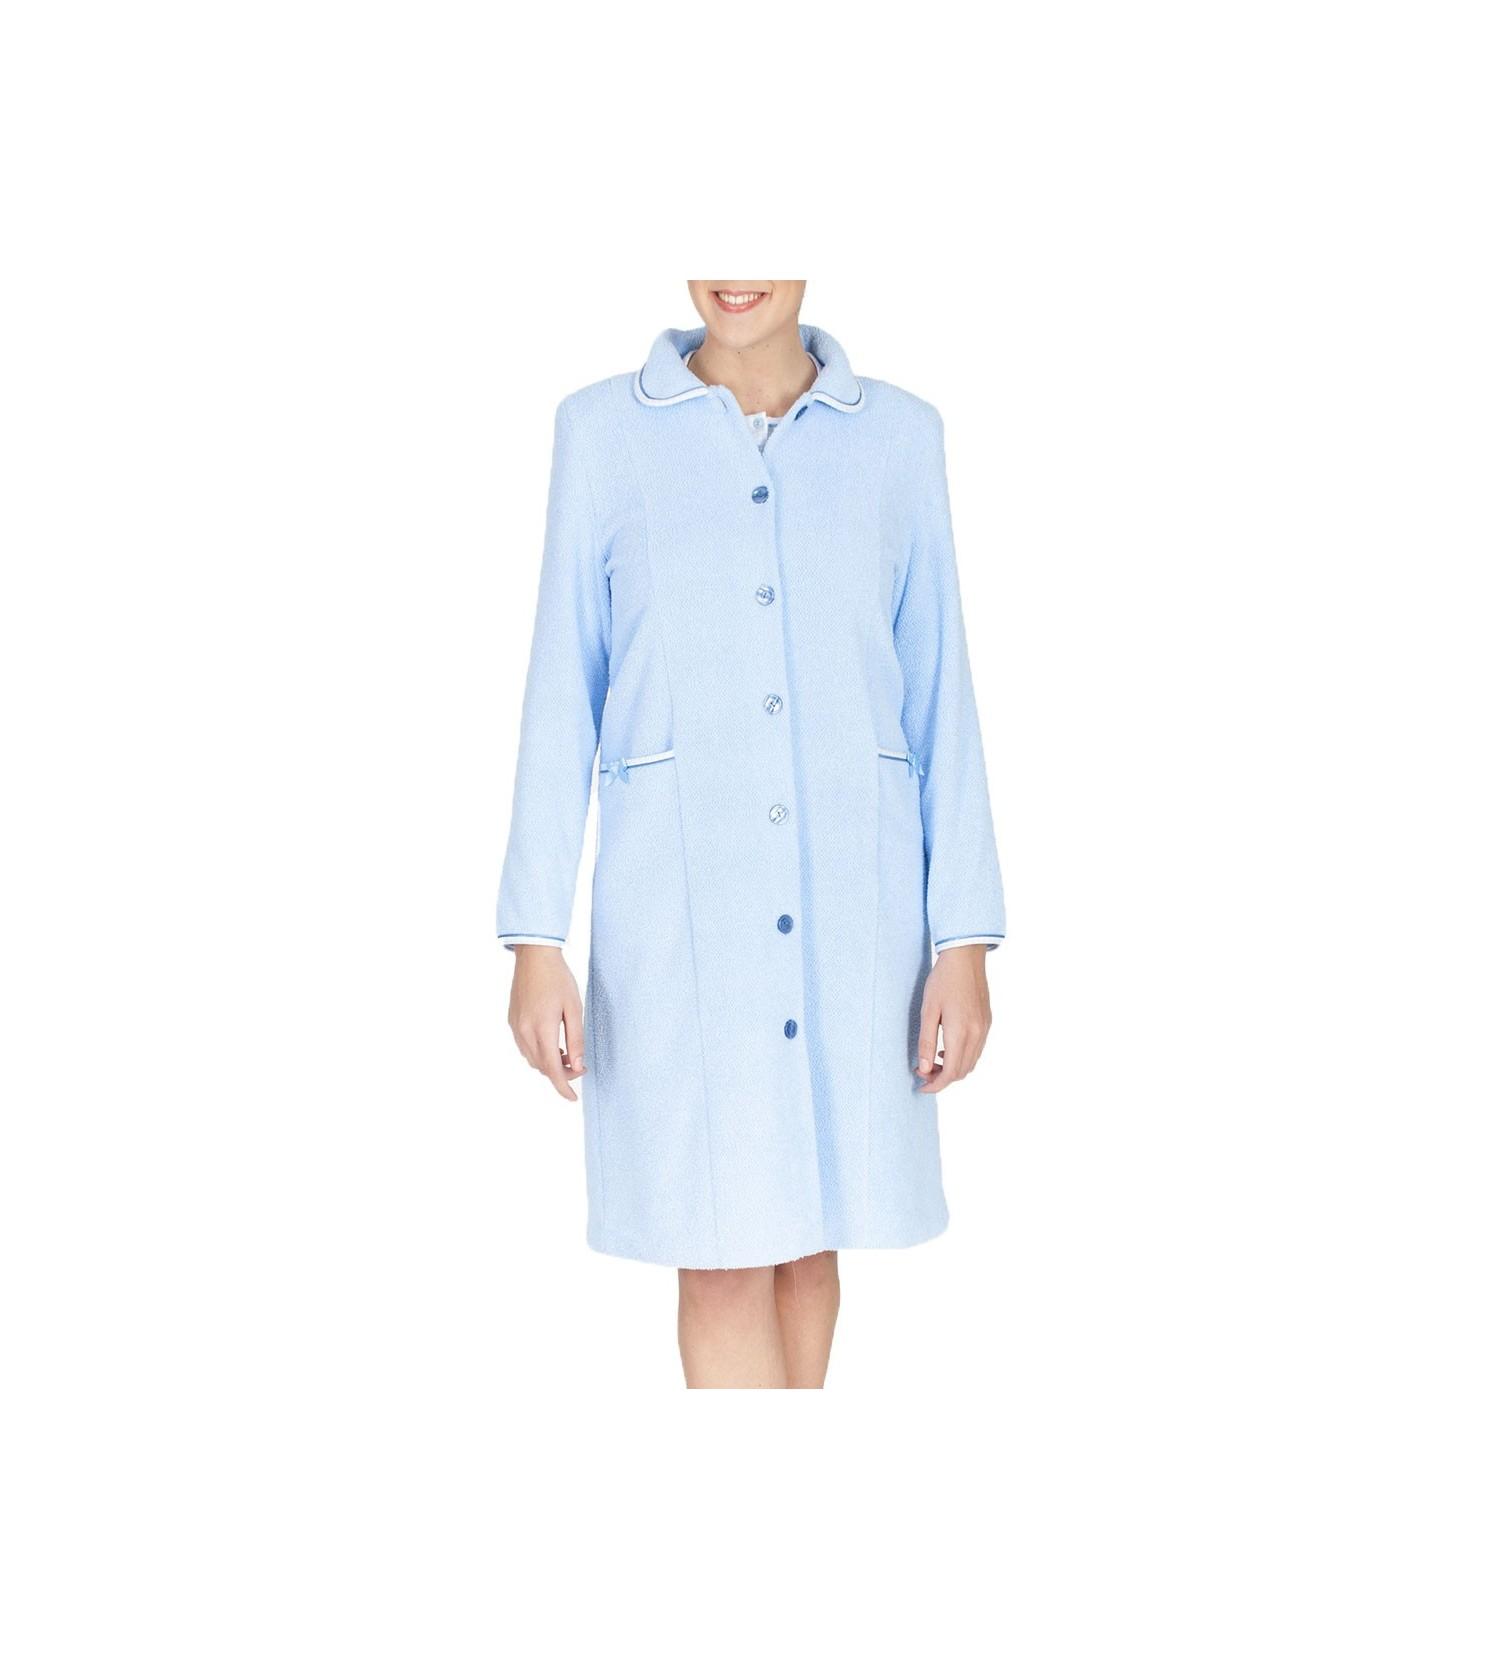 Robe de chambre boutonn e ciel lingerie sipp - Robes de chambre de marque ...